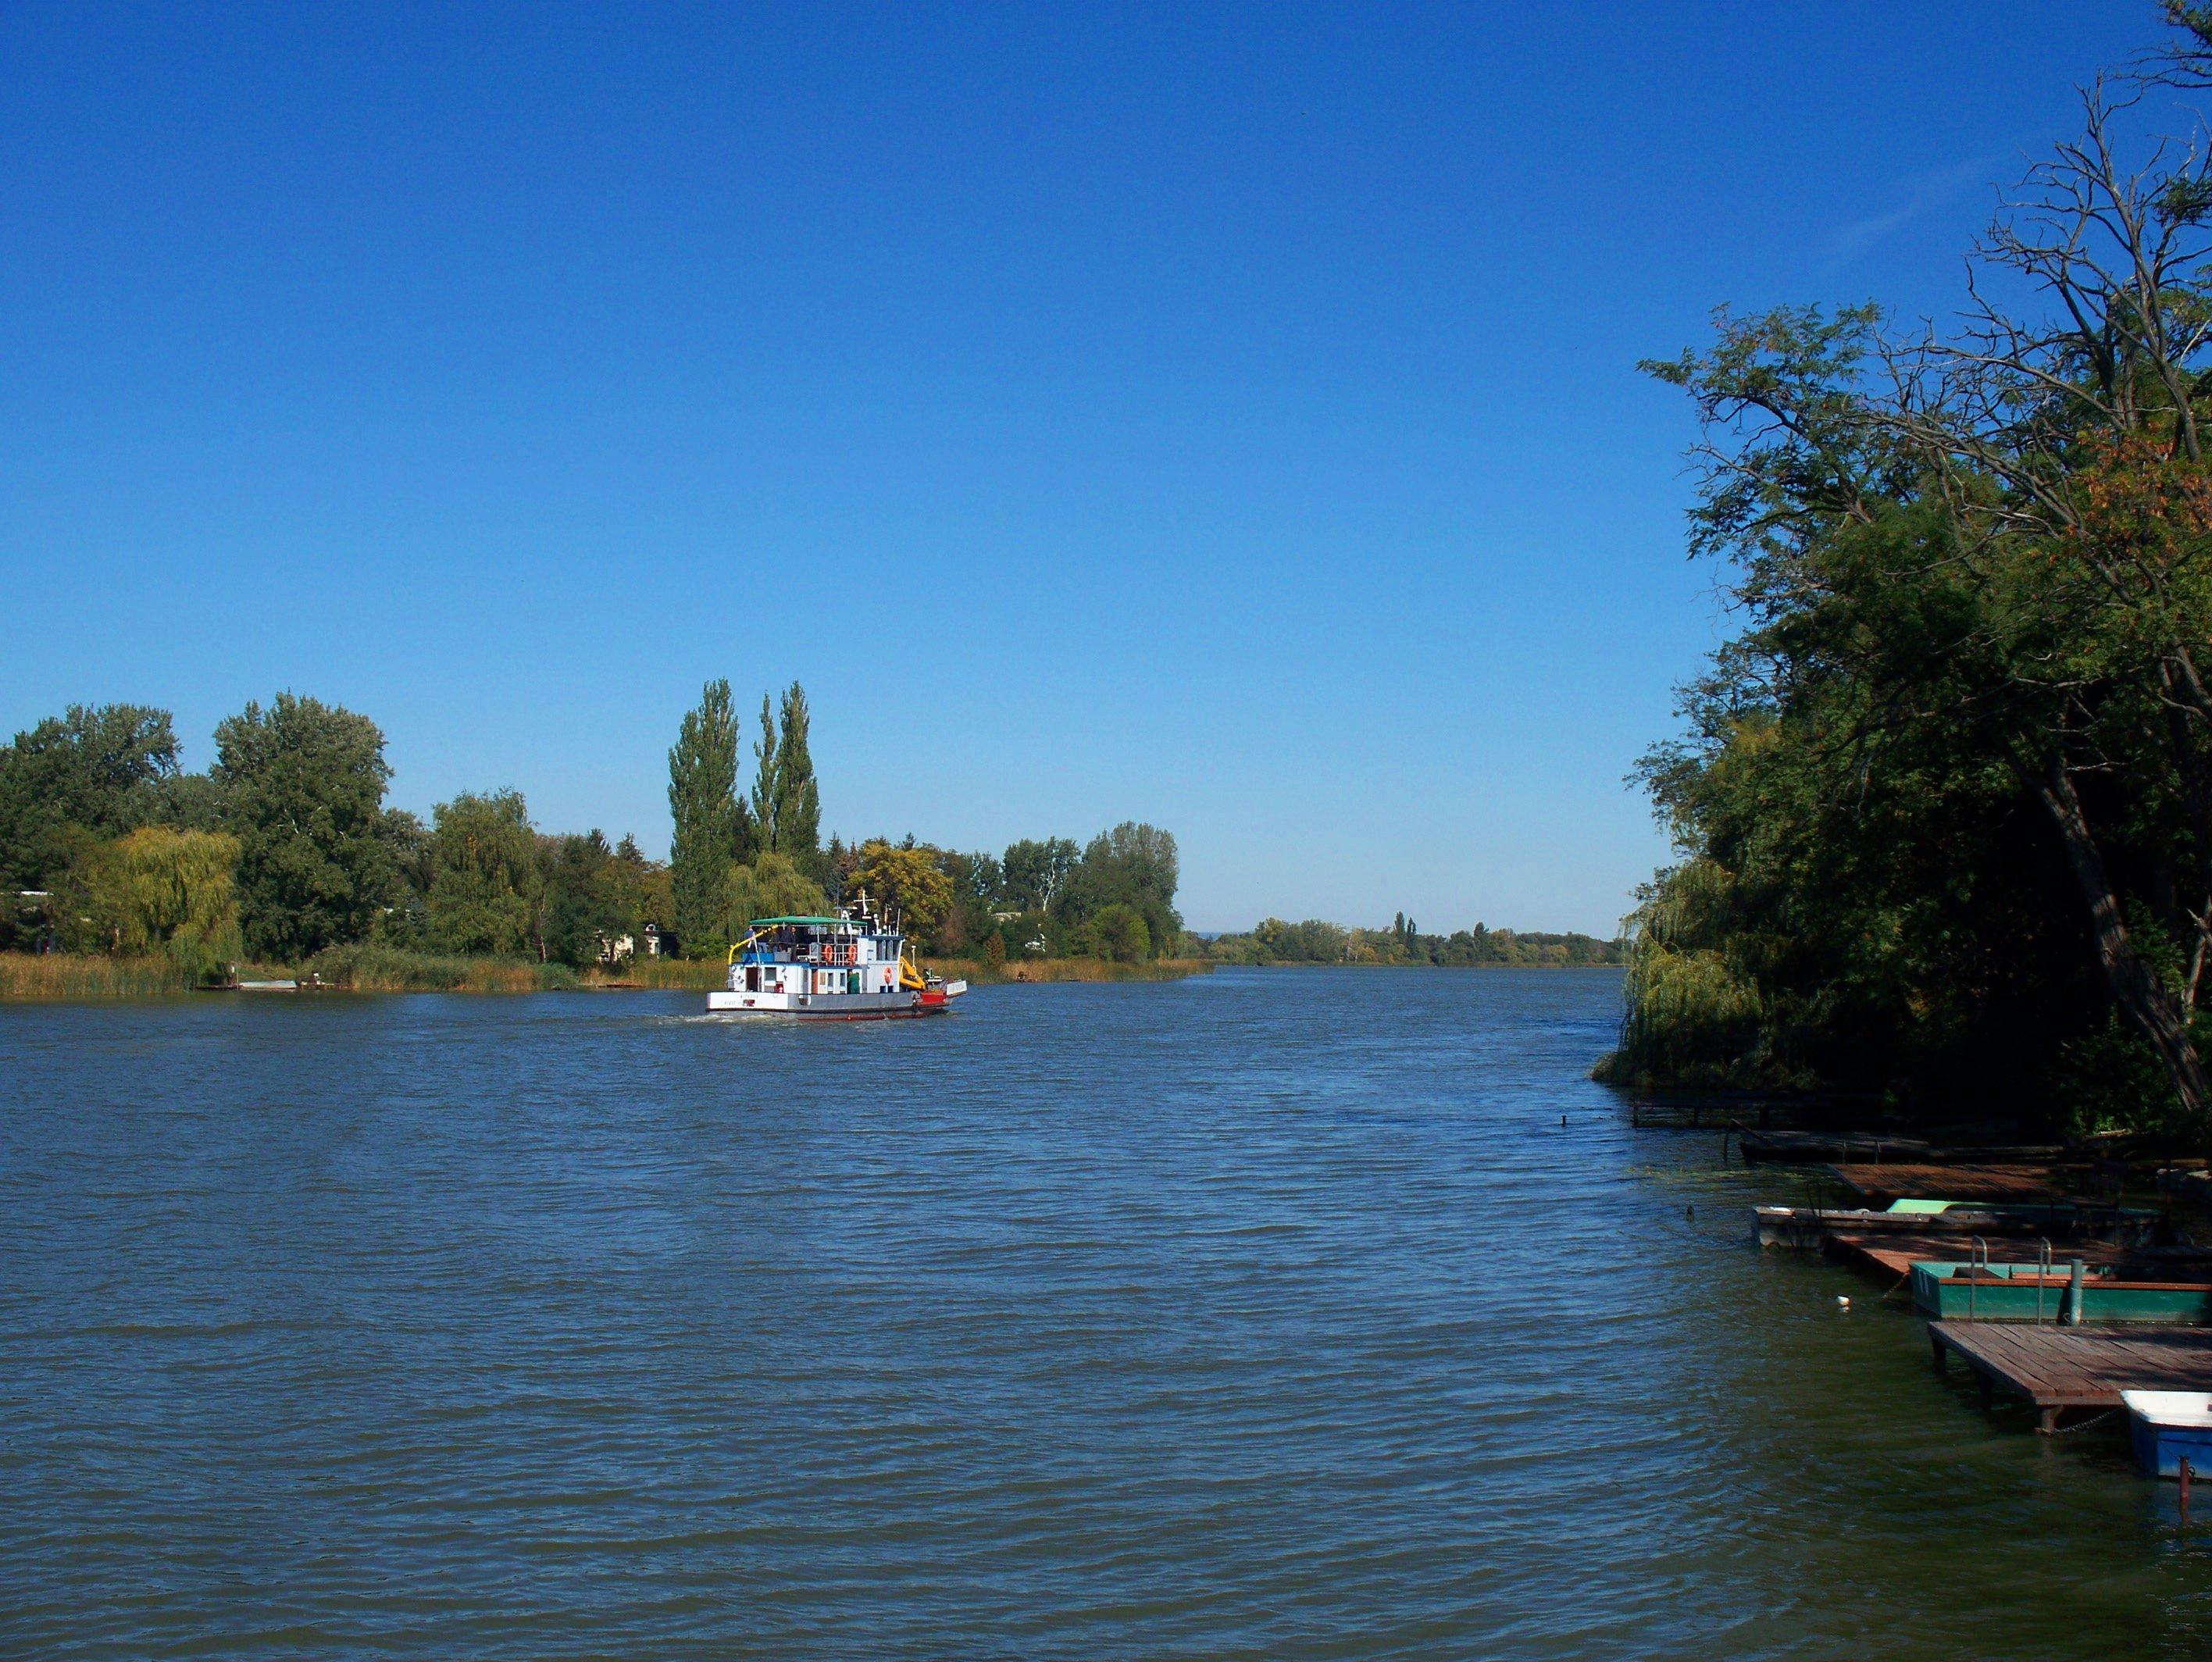 http://www.kisdunainagyhajok.hu/egyebhajok/2012_09_28_kituzo-v_motorhajo_a_kiskunlachazi_hajokikotonel/2012_09_28_kituzo-v_motorhajo_a_kiskunlachazi_hajokikotonel_016.jpg